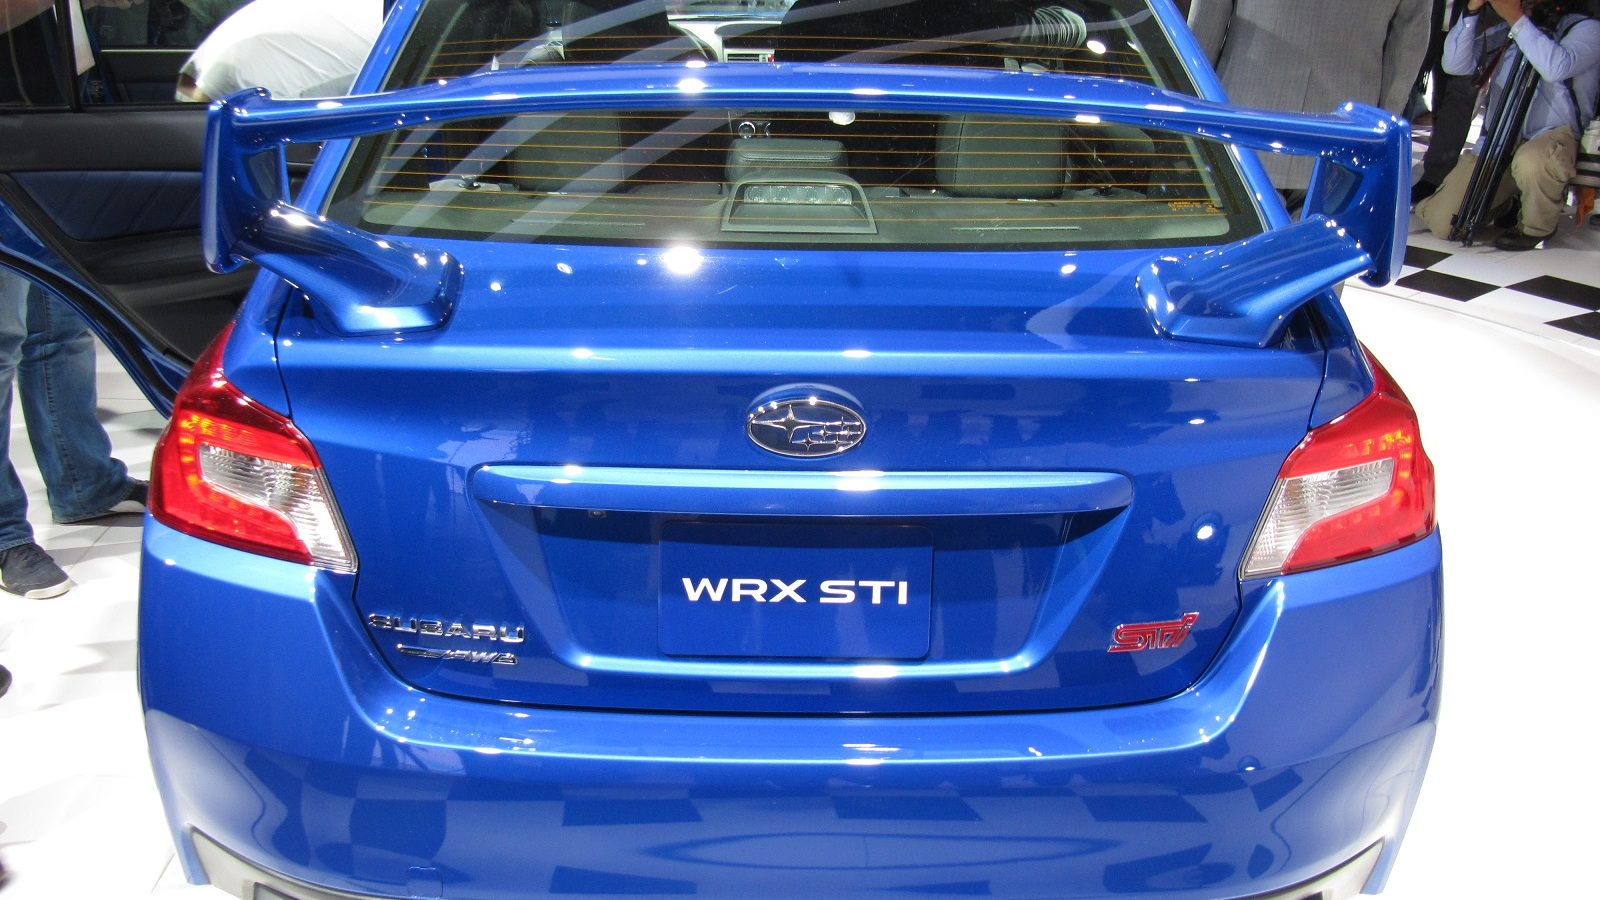 2015 Subaru WRX STI Launch Edition, introduced at 2014 Detroit Auto Show